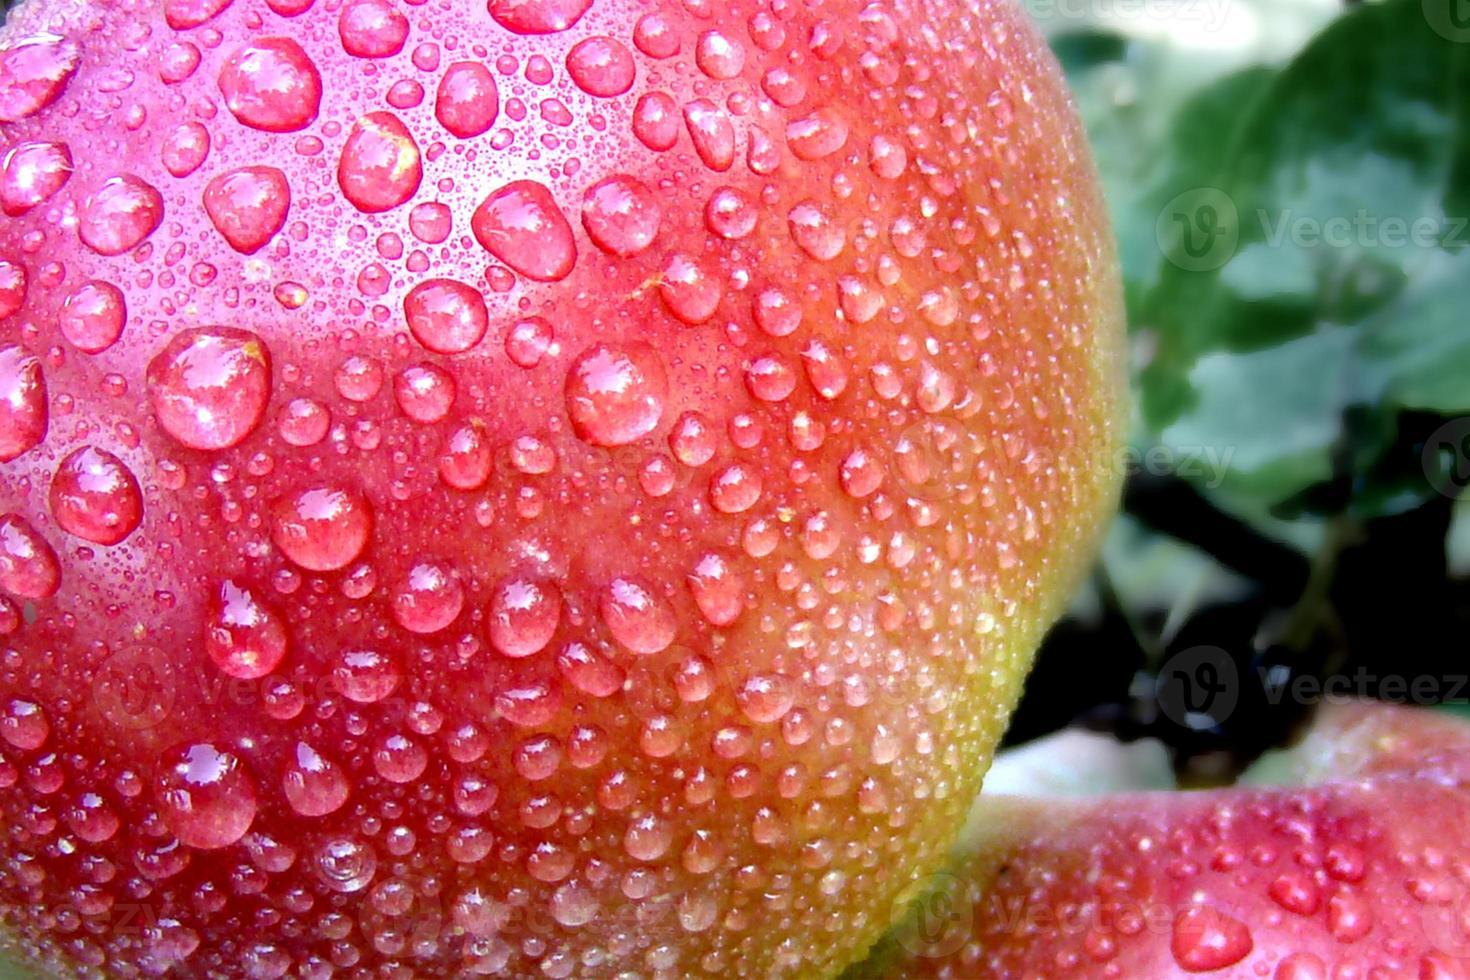 Rain drops on the fruit of the Apple tree. photo